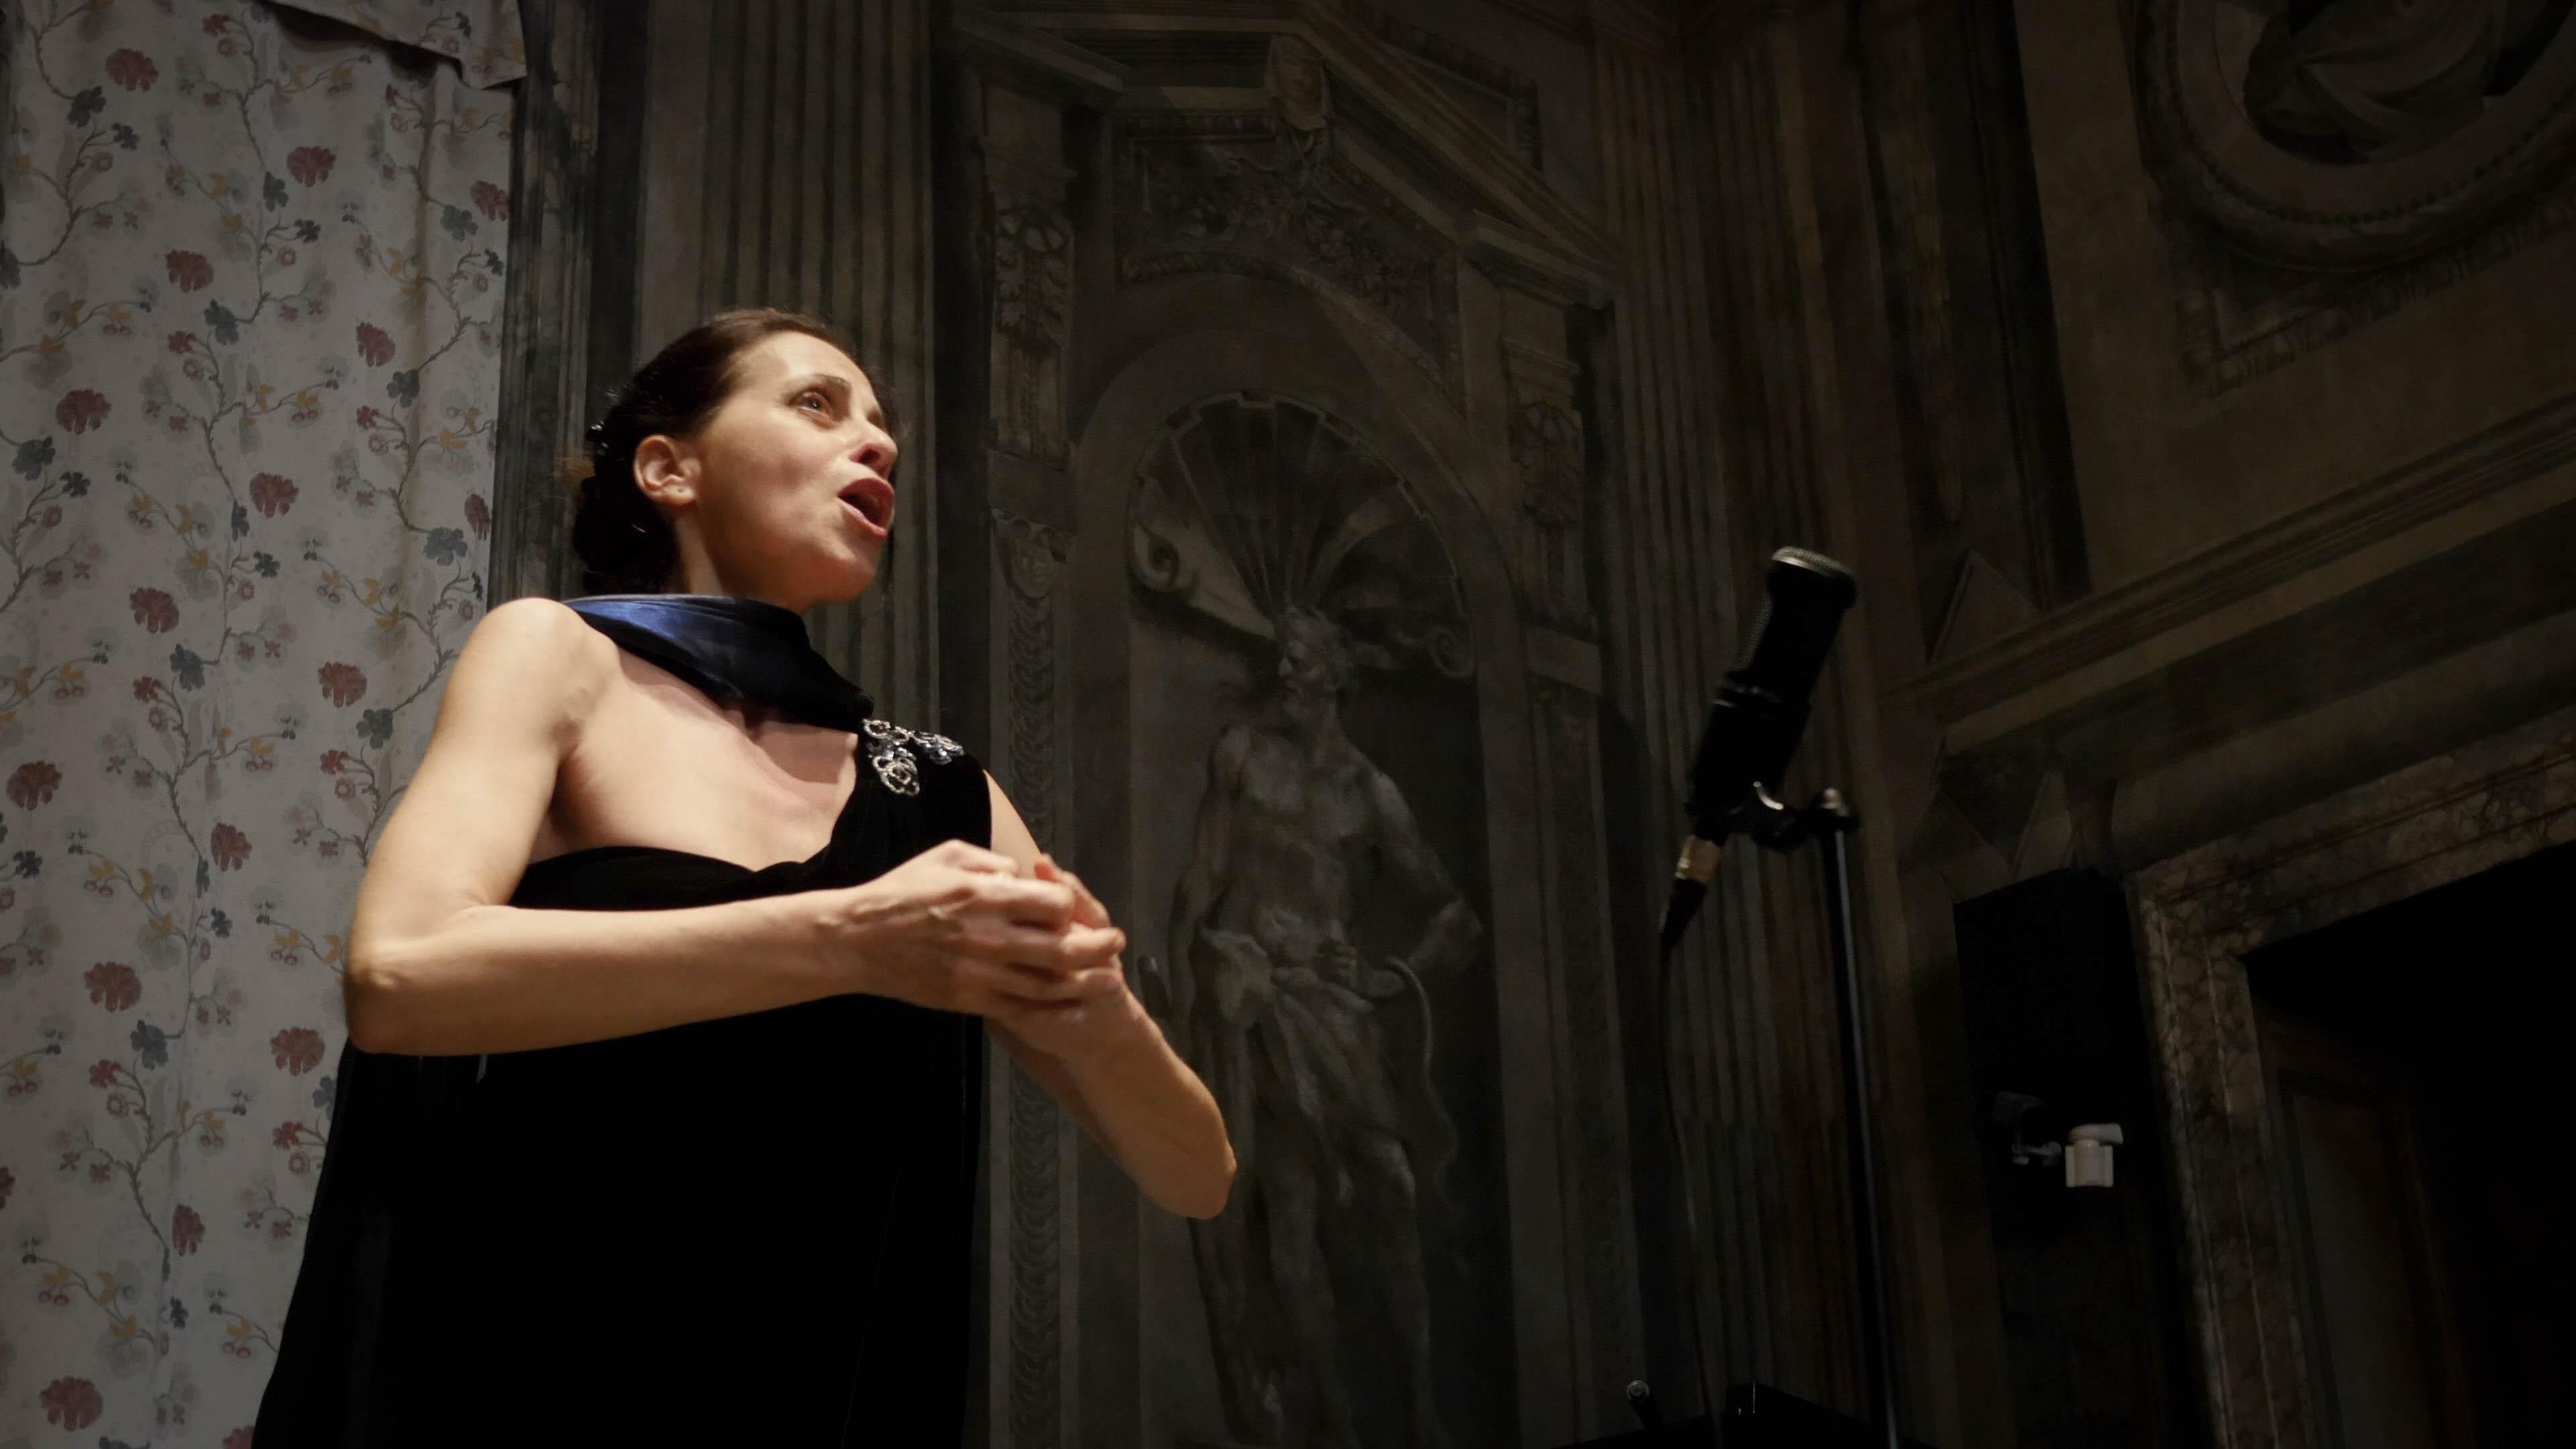 Woman singing opera